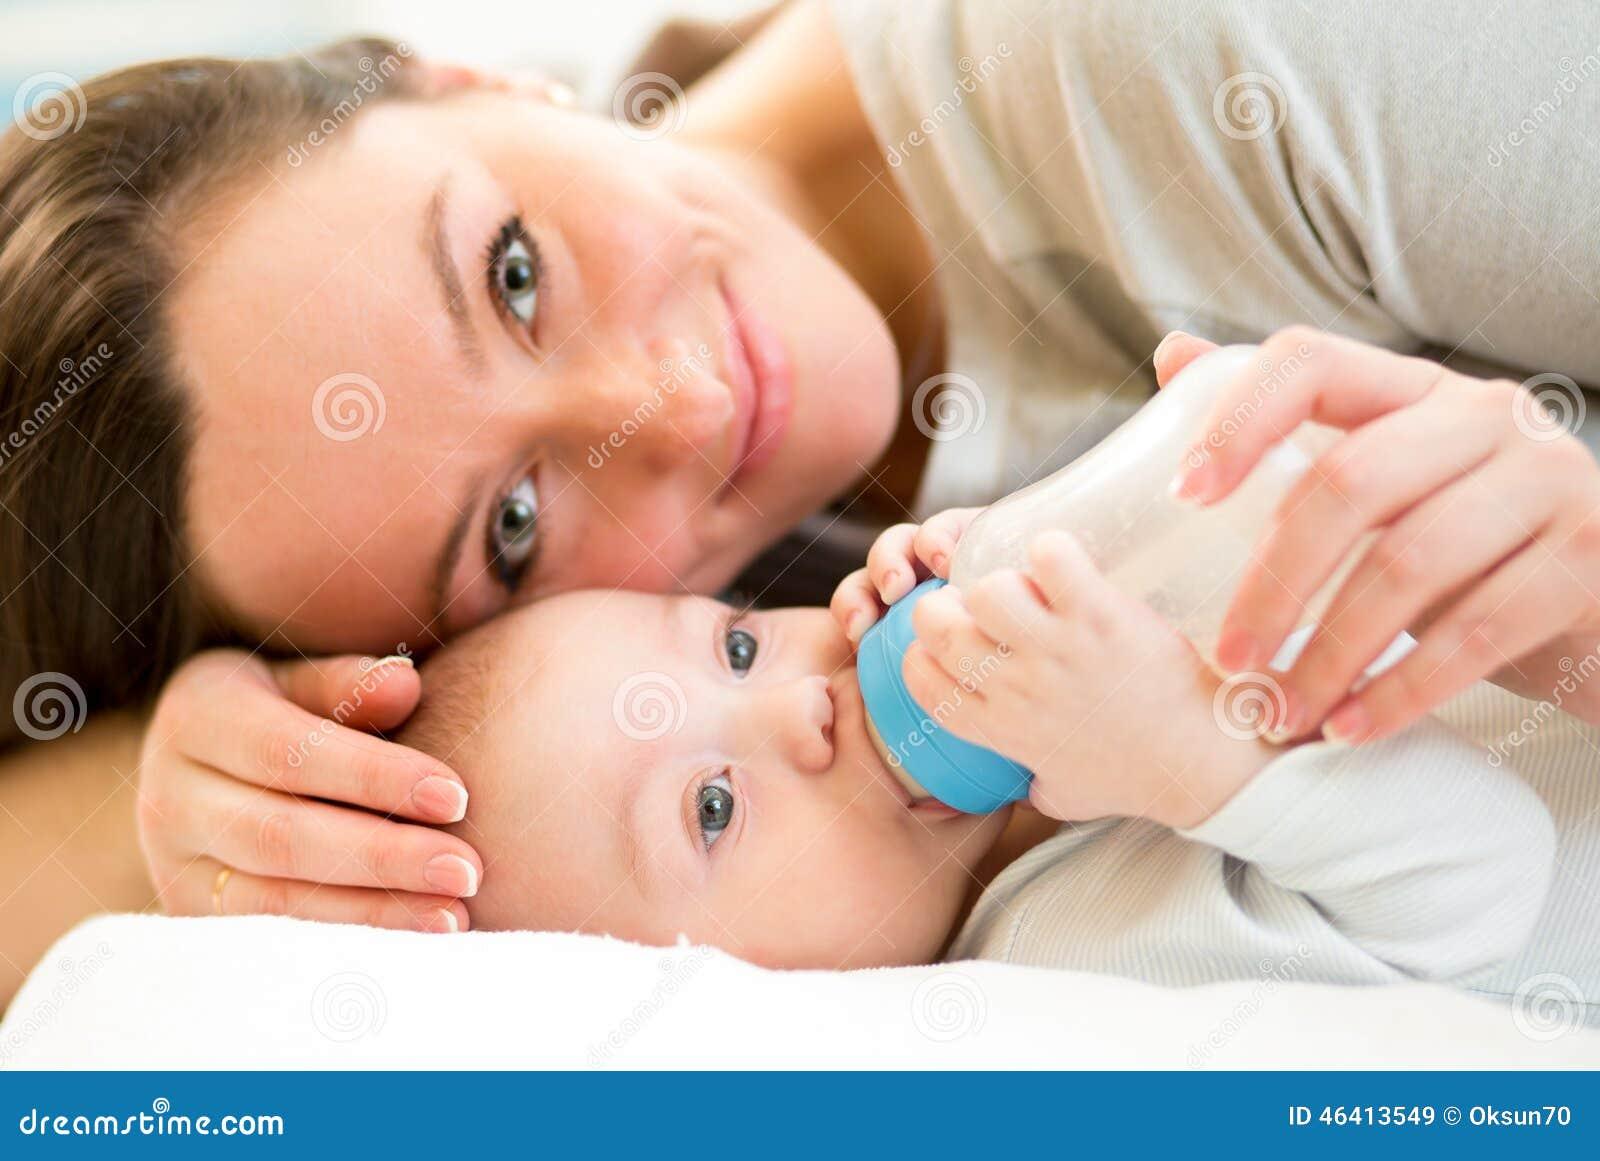 baby 5 maanden flesvoeding